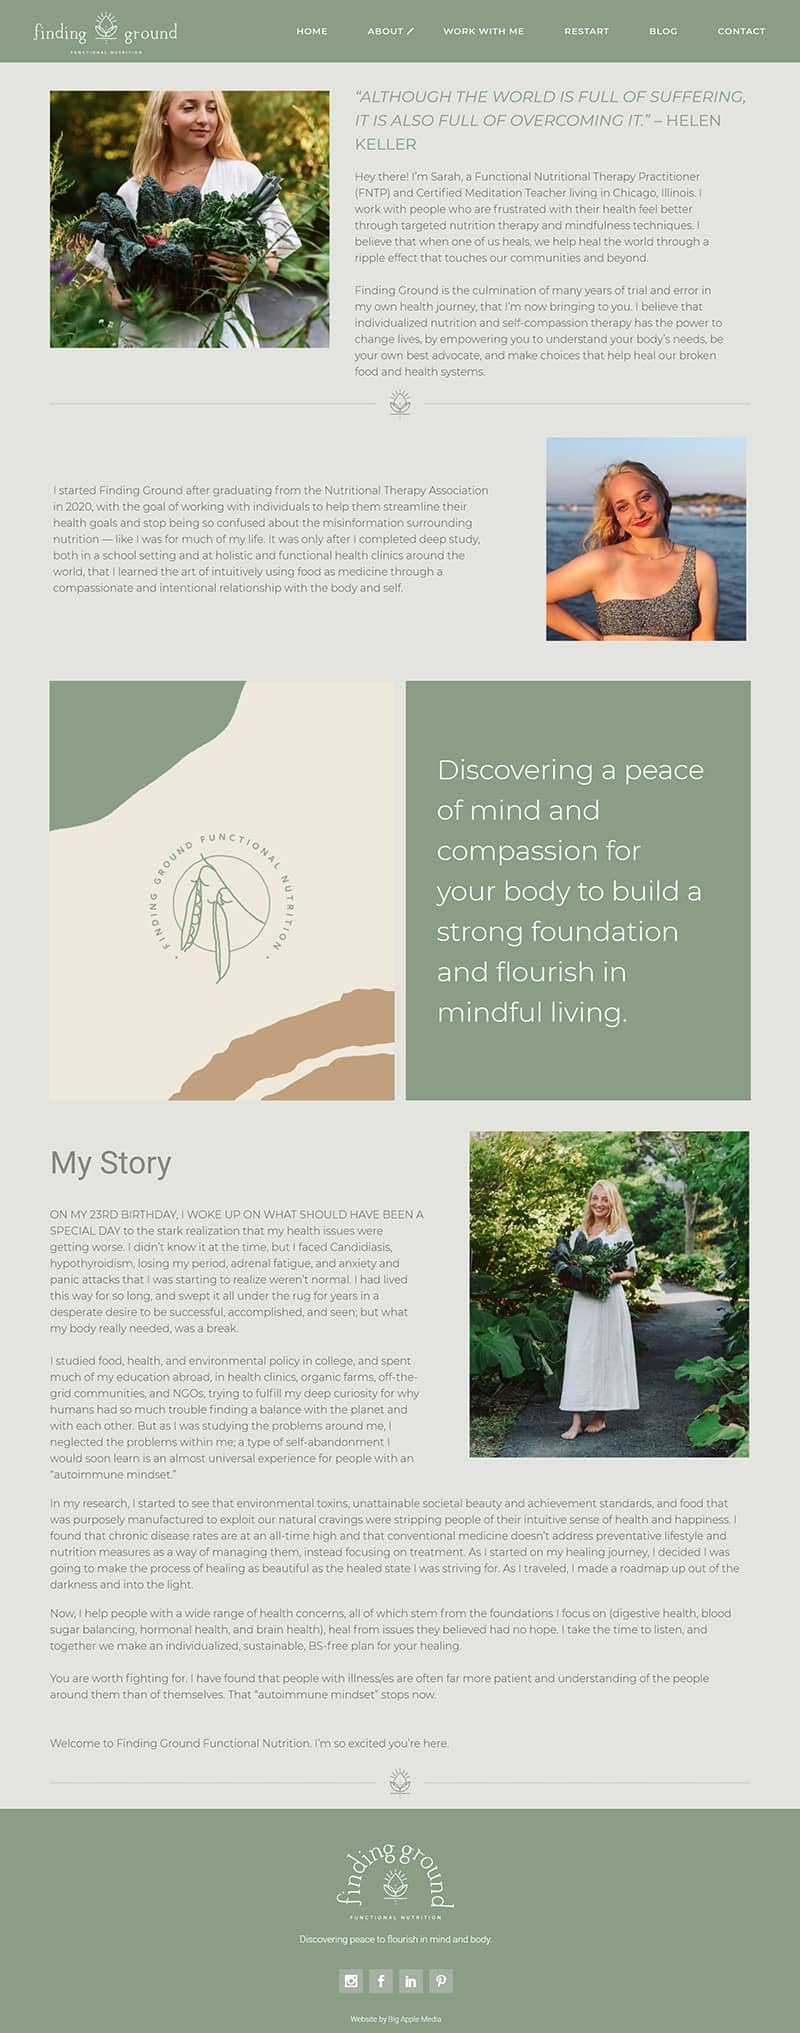 health web design services